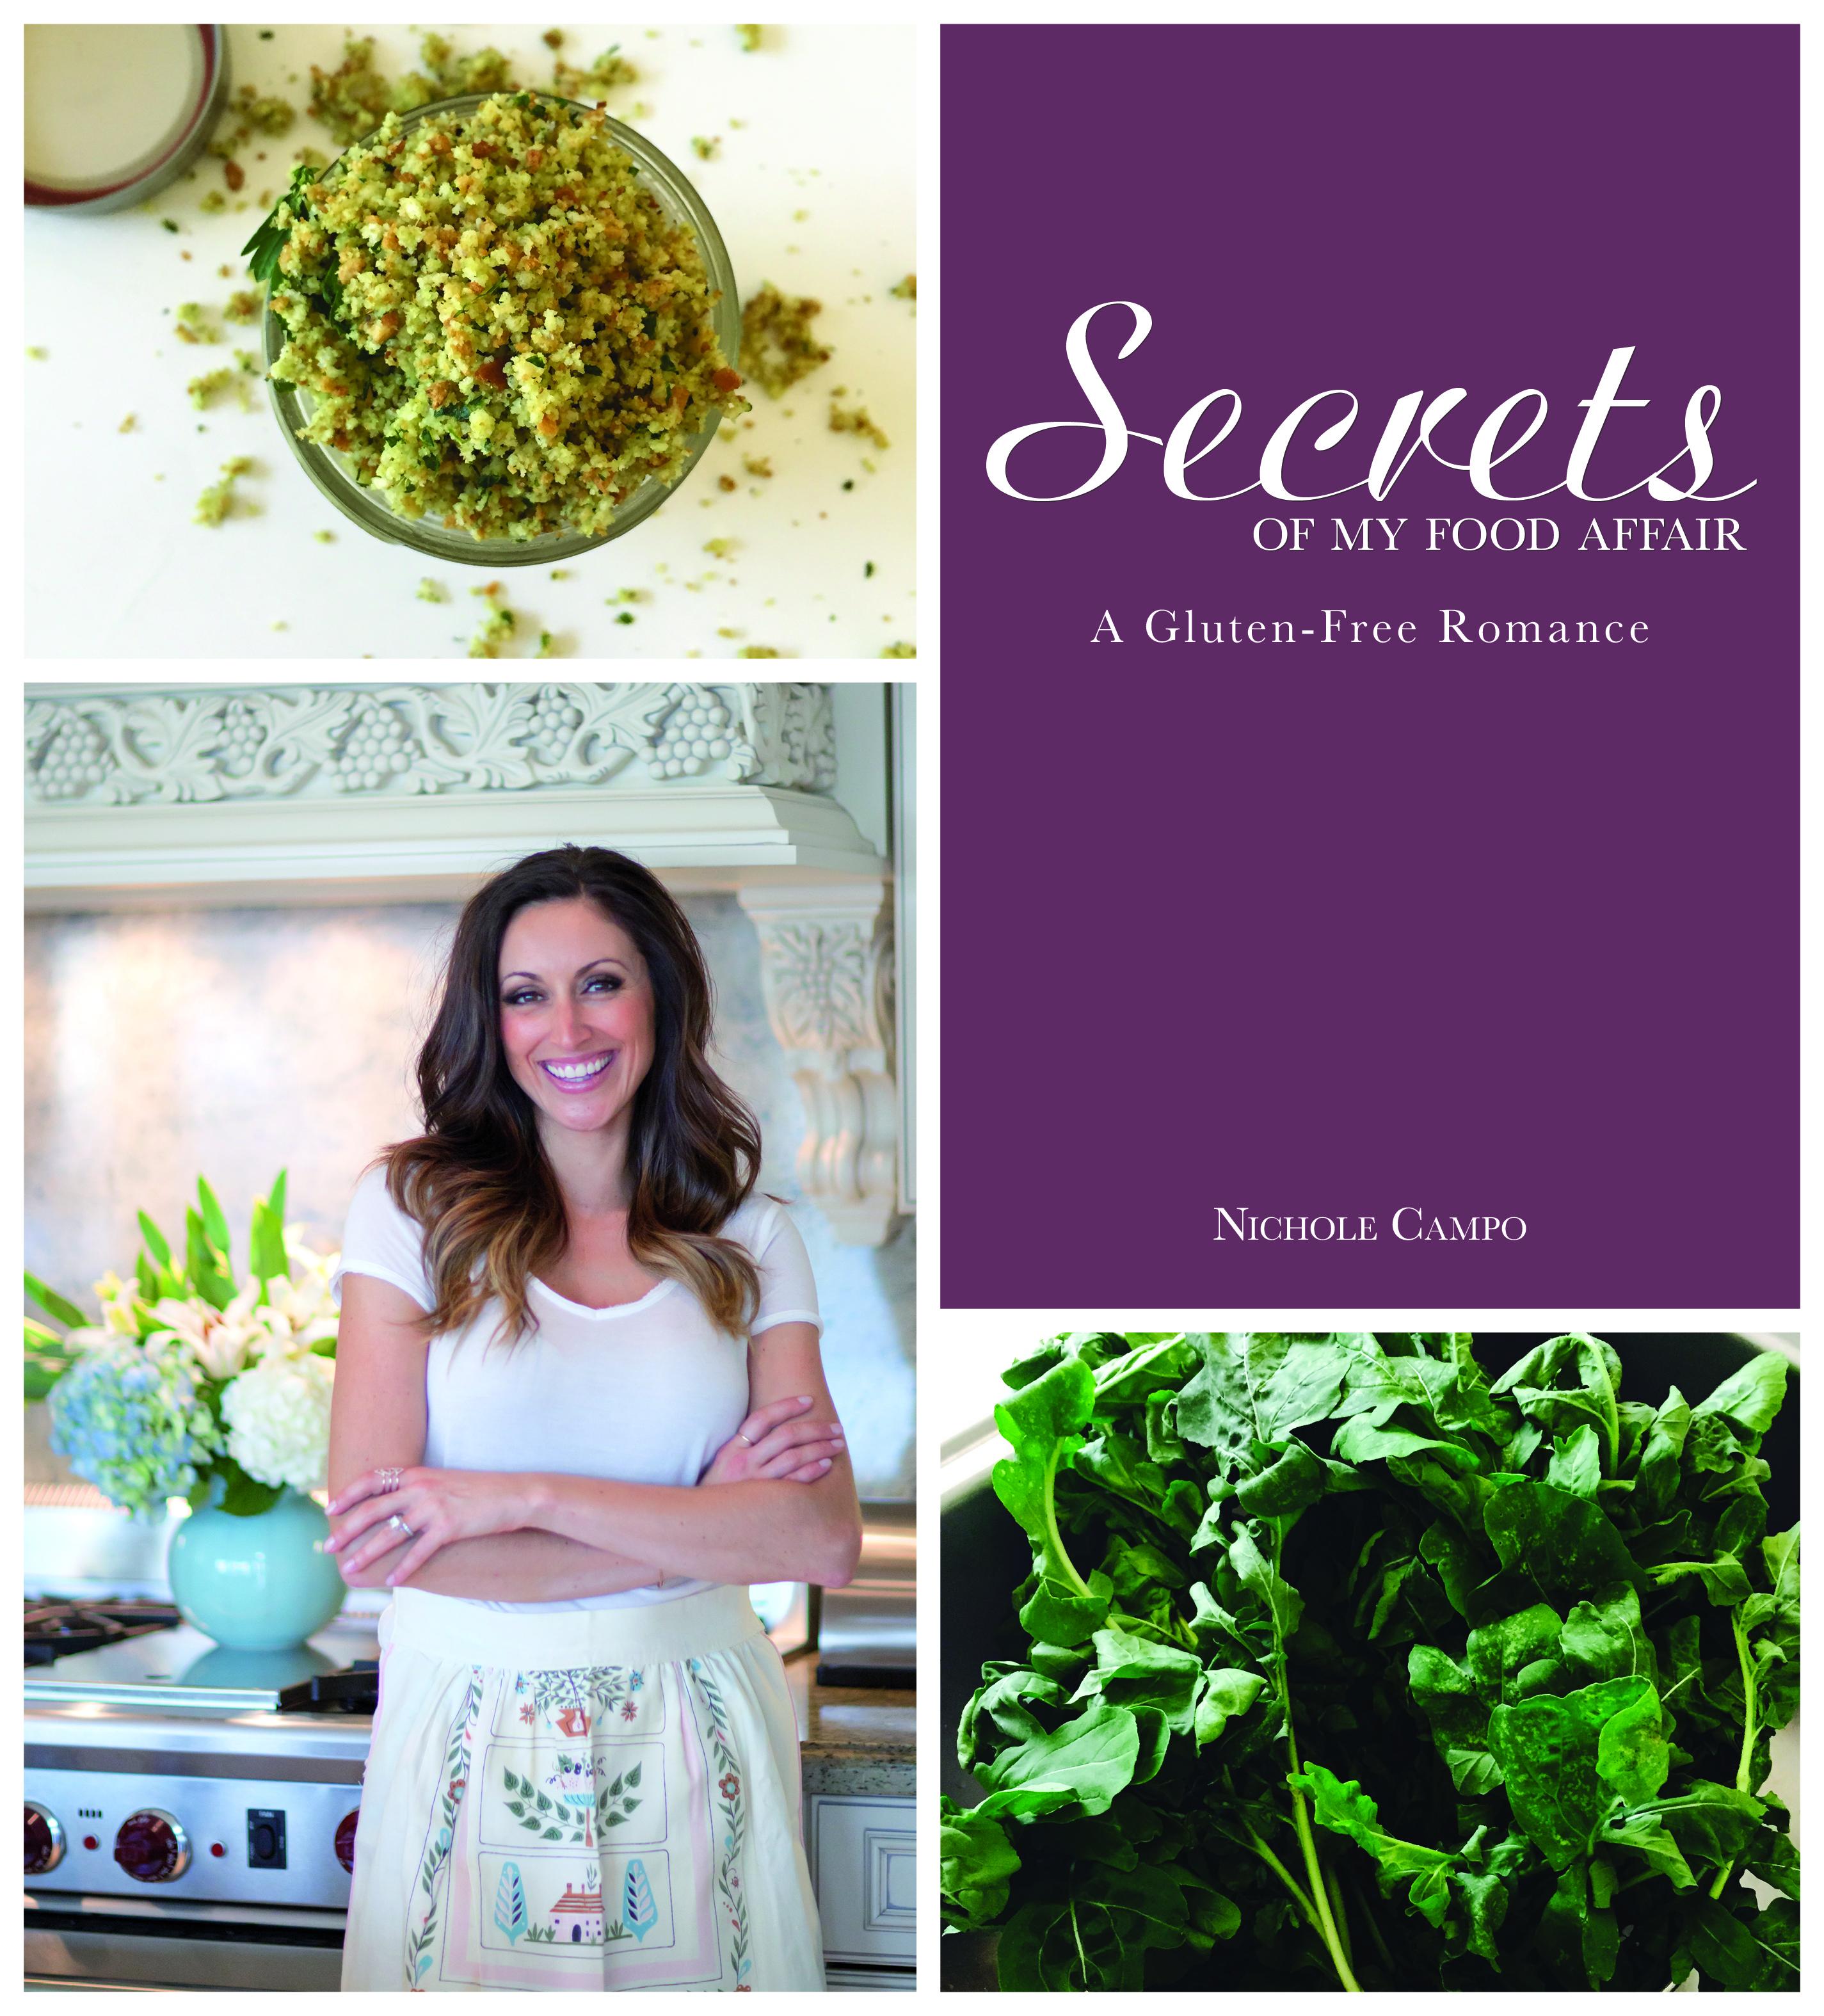 Secrets Of My Food Affair